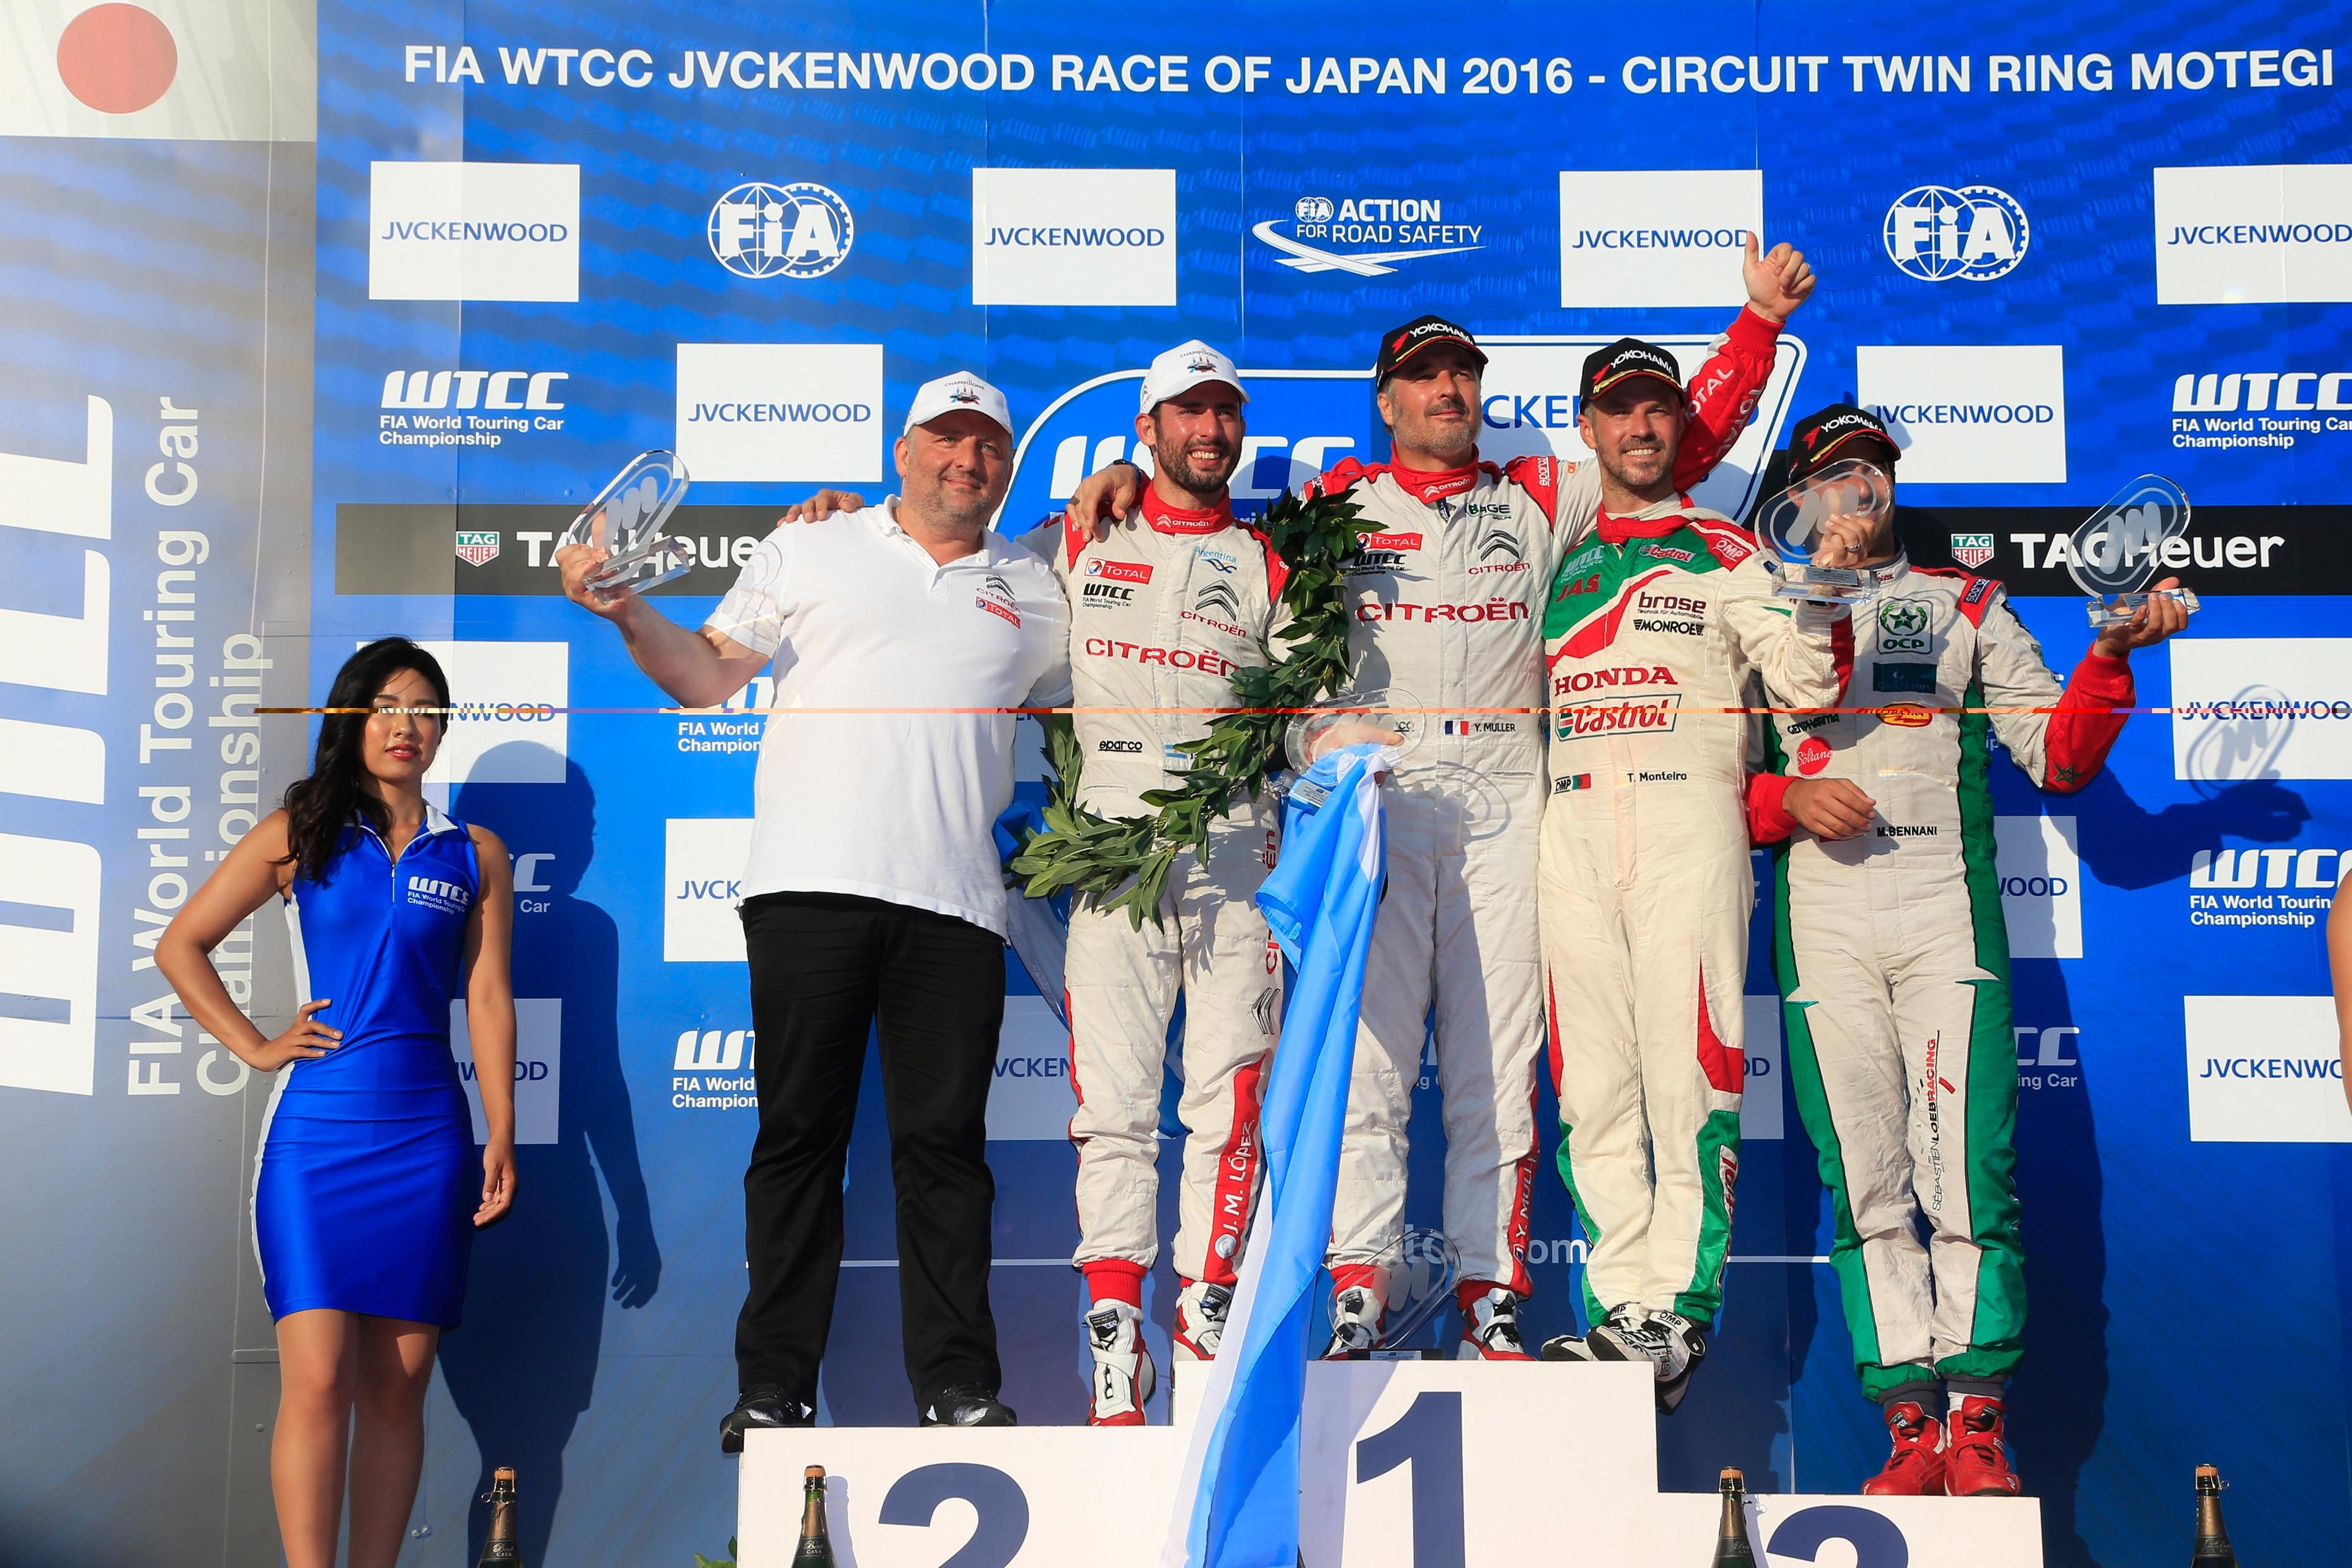 FIA WORLD TOURING CAR CHAMPIONSHIP 2016 - JAPAN - MOTEGI - WTCC - 01/09/2016 TO 04/09/2016 - PHOTO :  @World CITROEN TOTAL WTCC - YVES MATTON 68- YVAN MULLER - CITROEN TOTAL WTCC 37-JOSÉ MARIA LOPEZ - CITROEN TOTAL WTCC